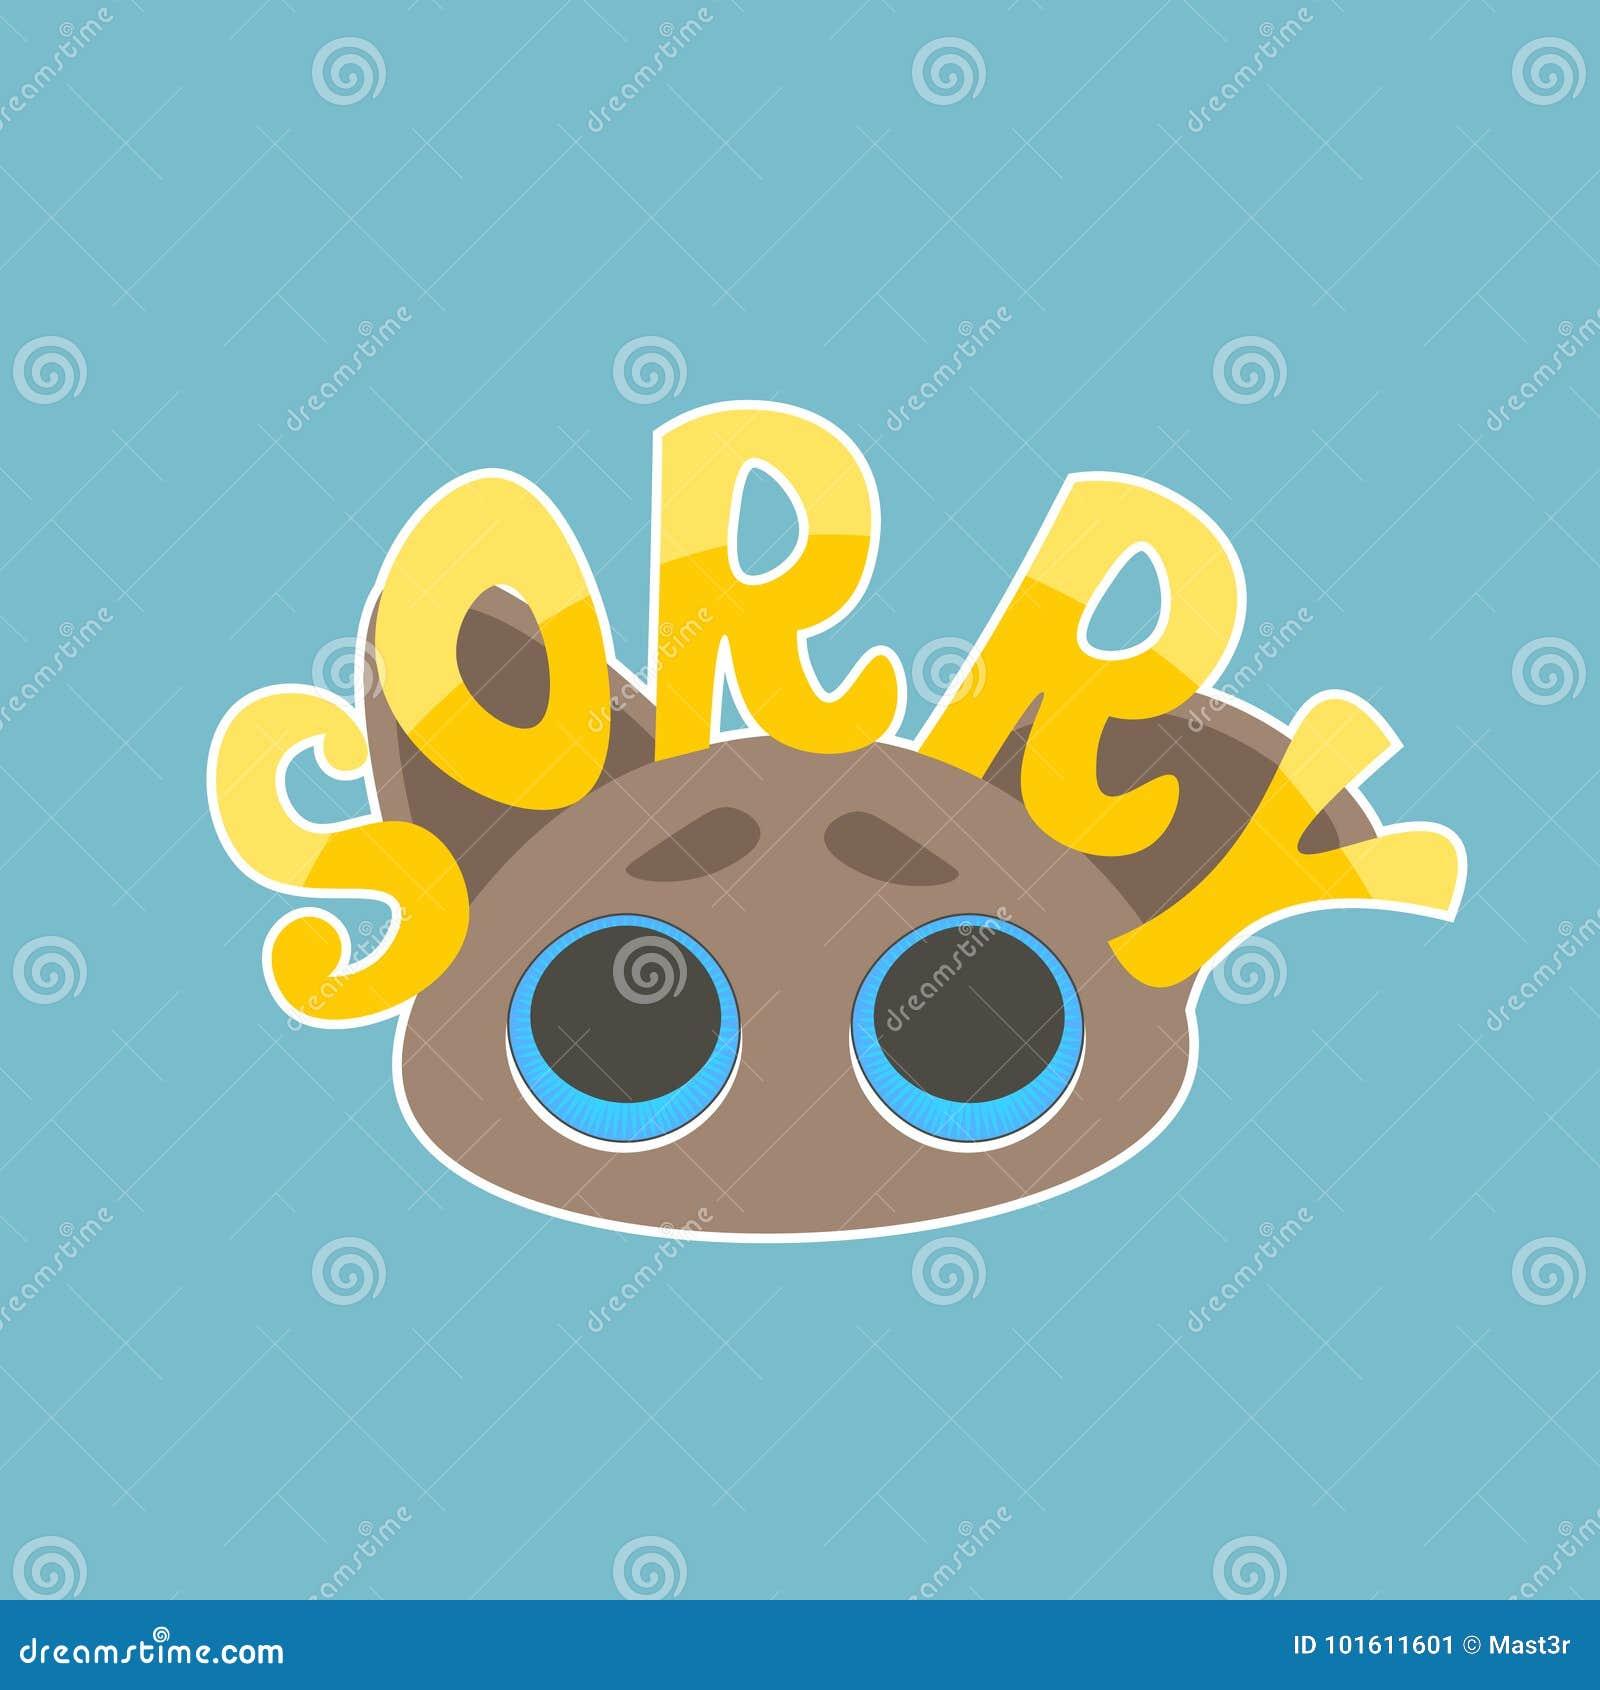 sorry sticker social media network message badges design stock